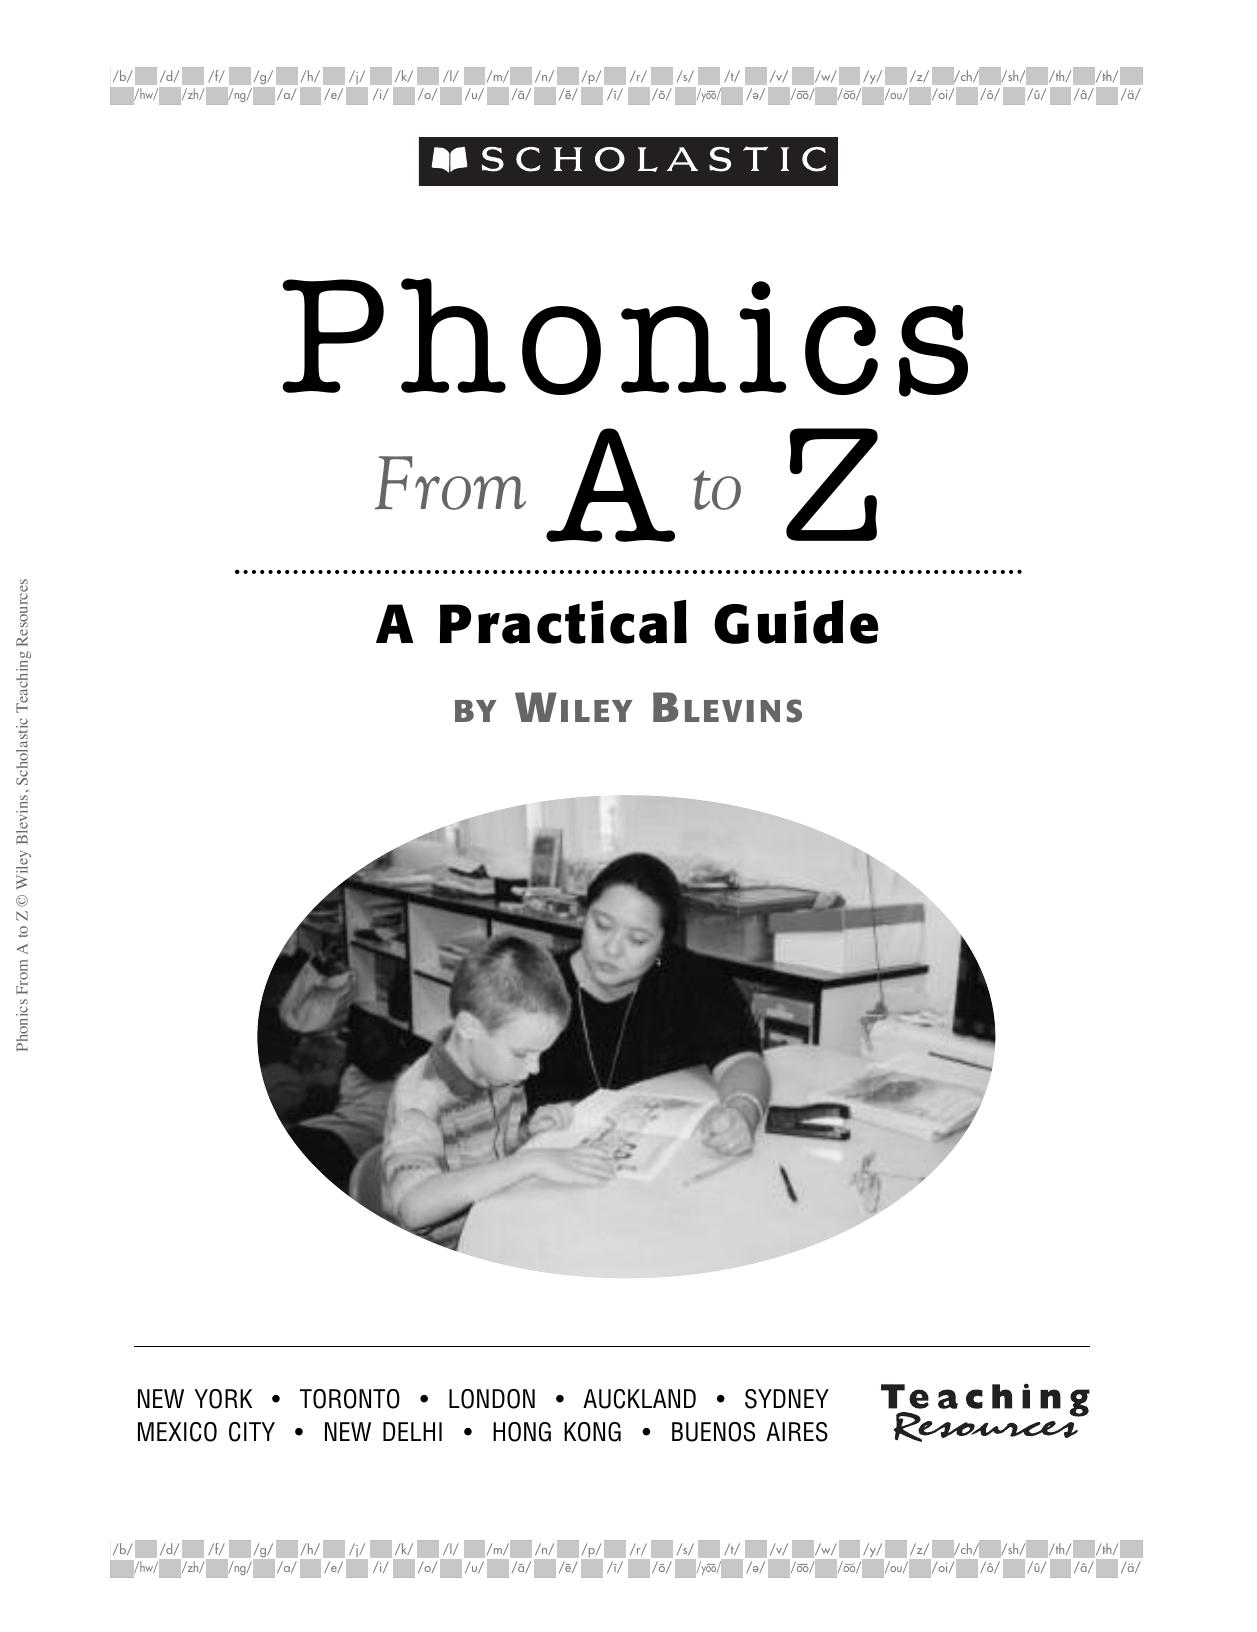 Phonics A To Z Teaching All Learners Diamond Kite Diagram Kitelife Magazine Issue 38 Quotno Secretsquot Trains